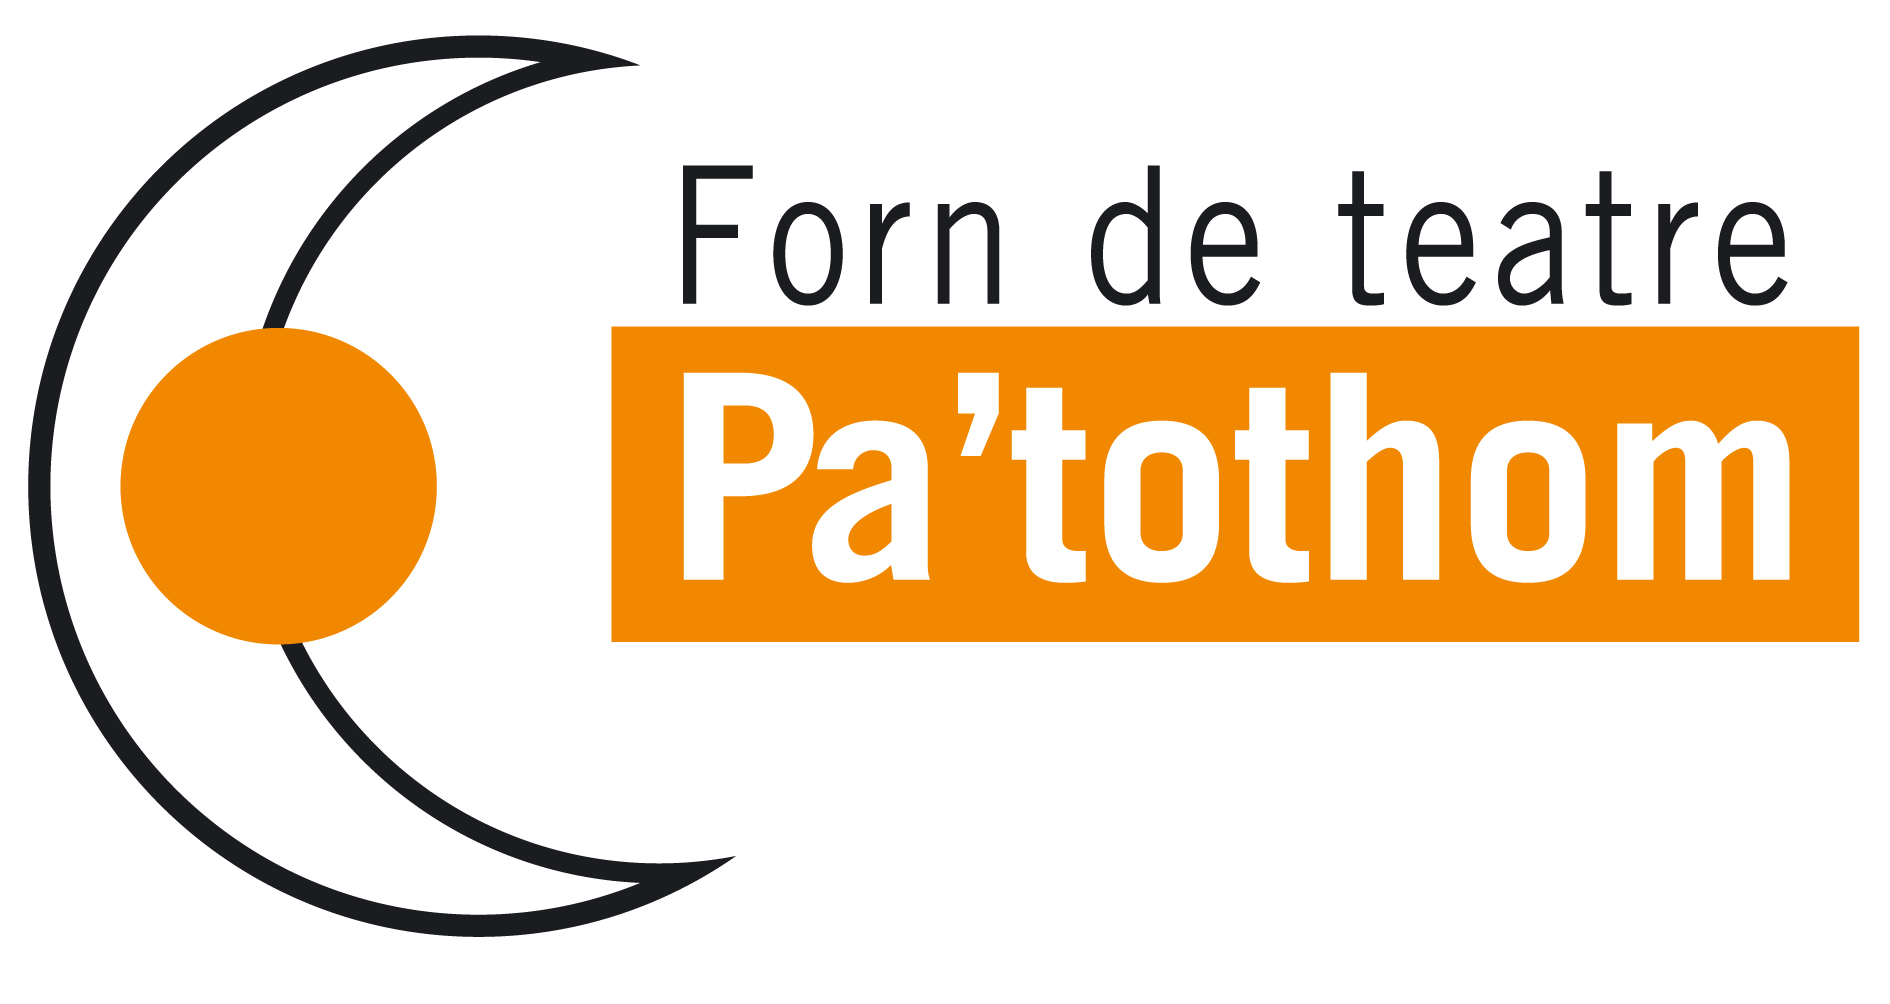 patothom